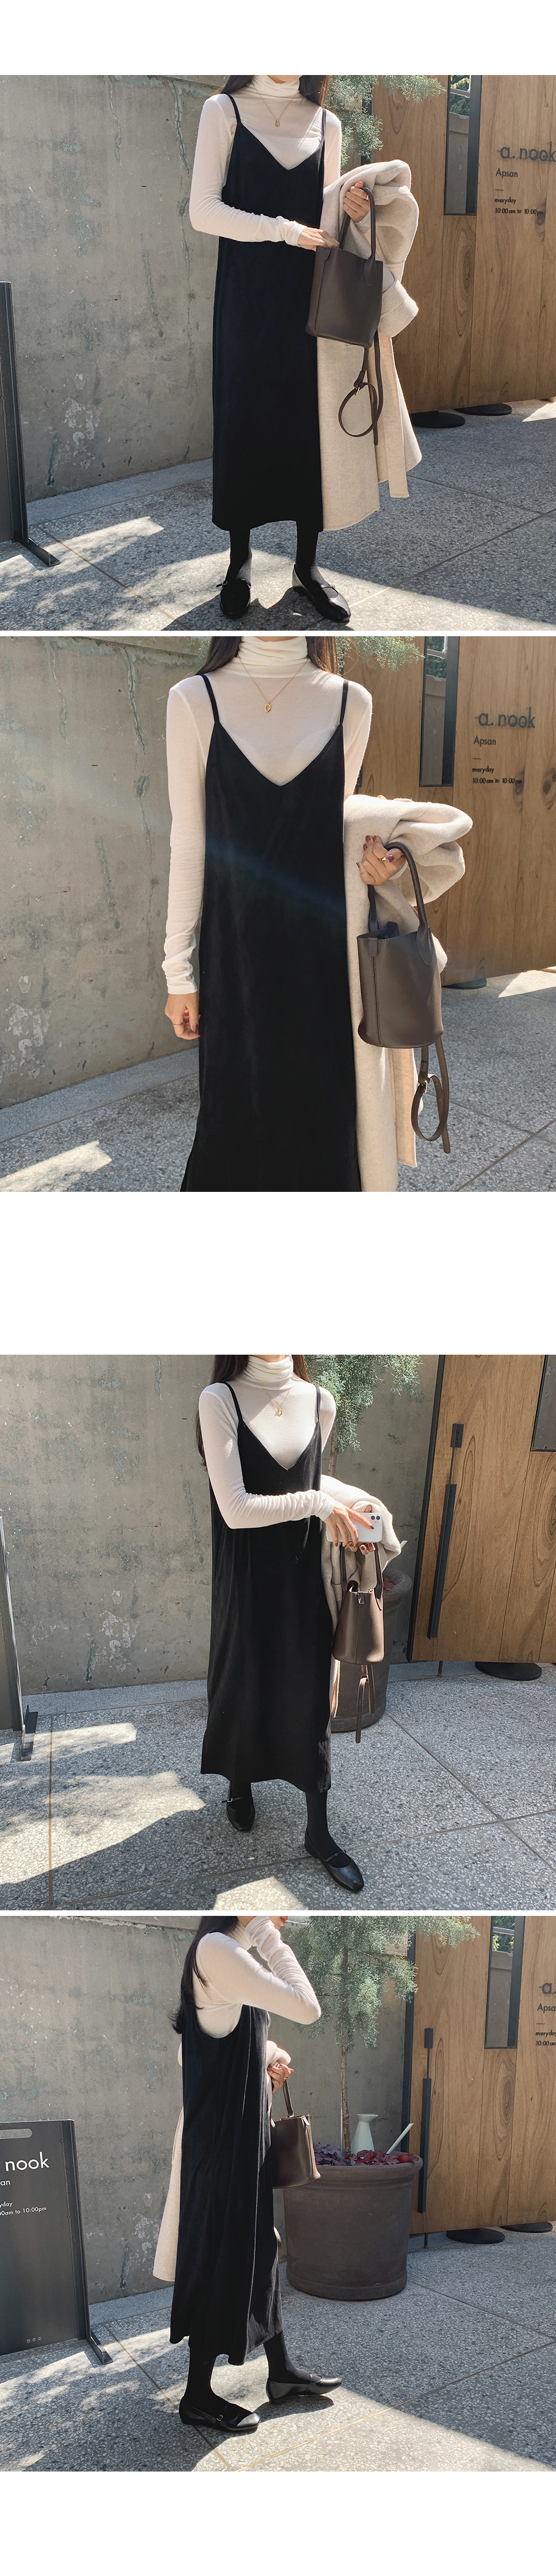 Suede Sleeveless Layered dress-holiholic.com